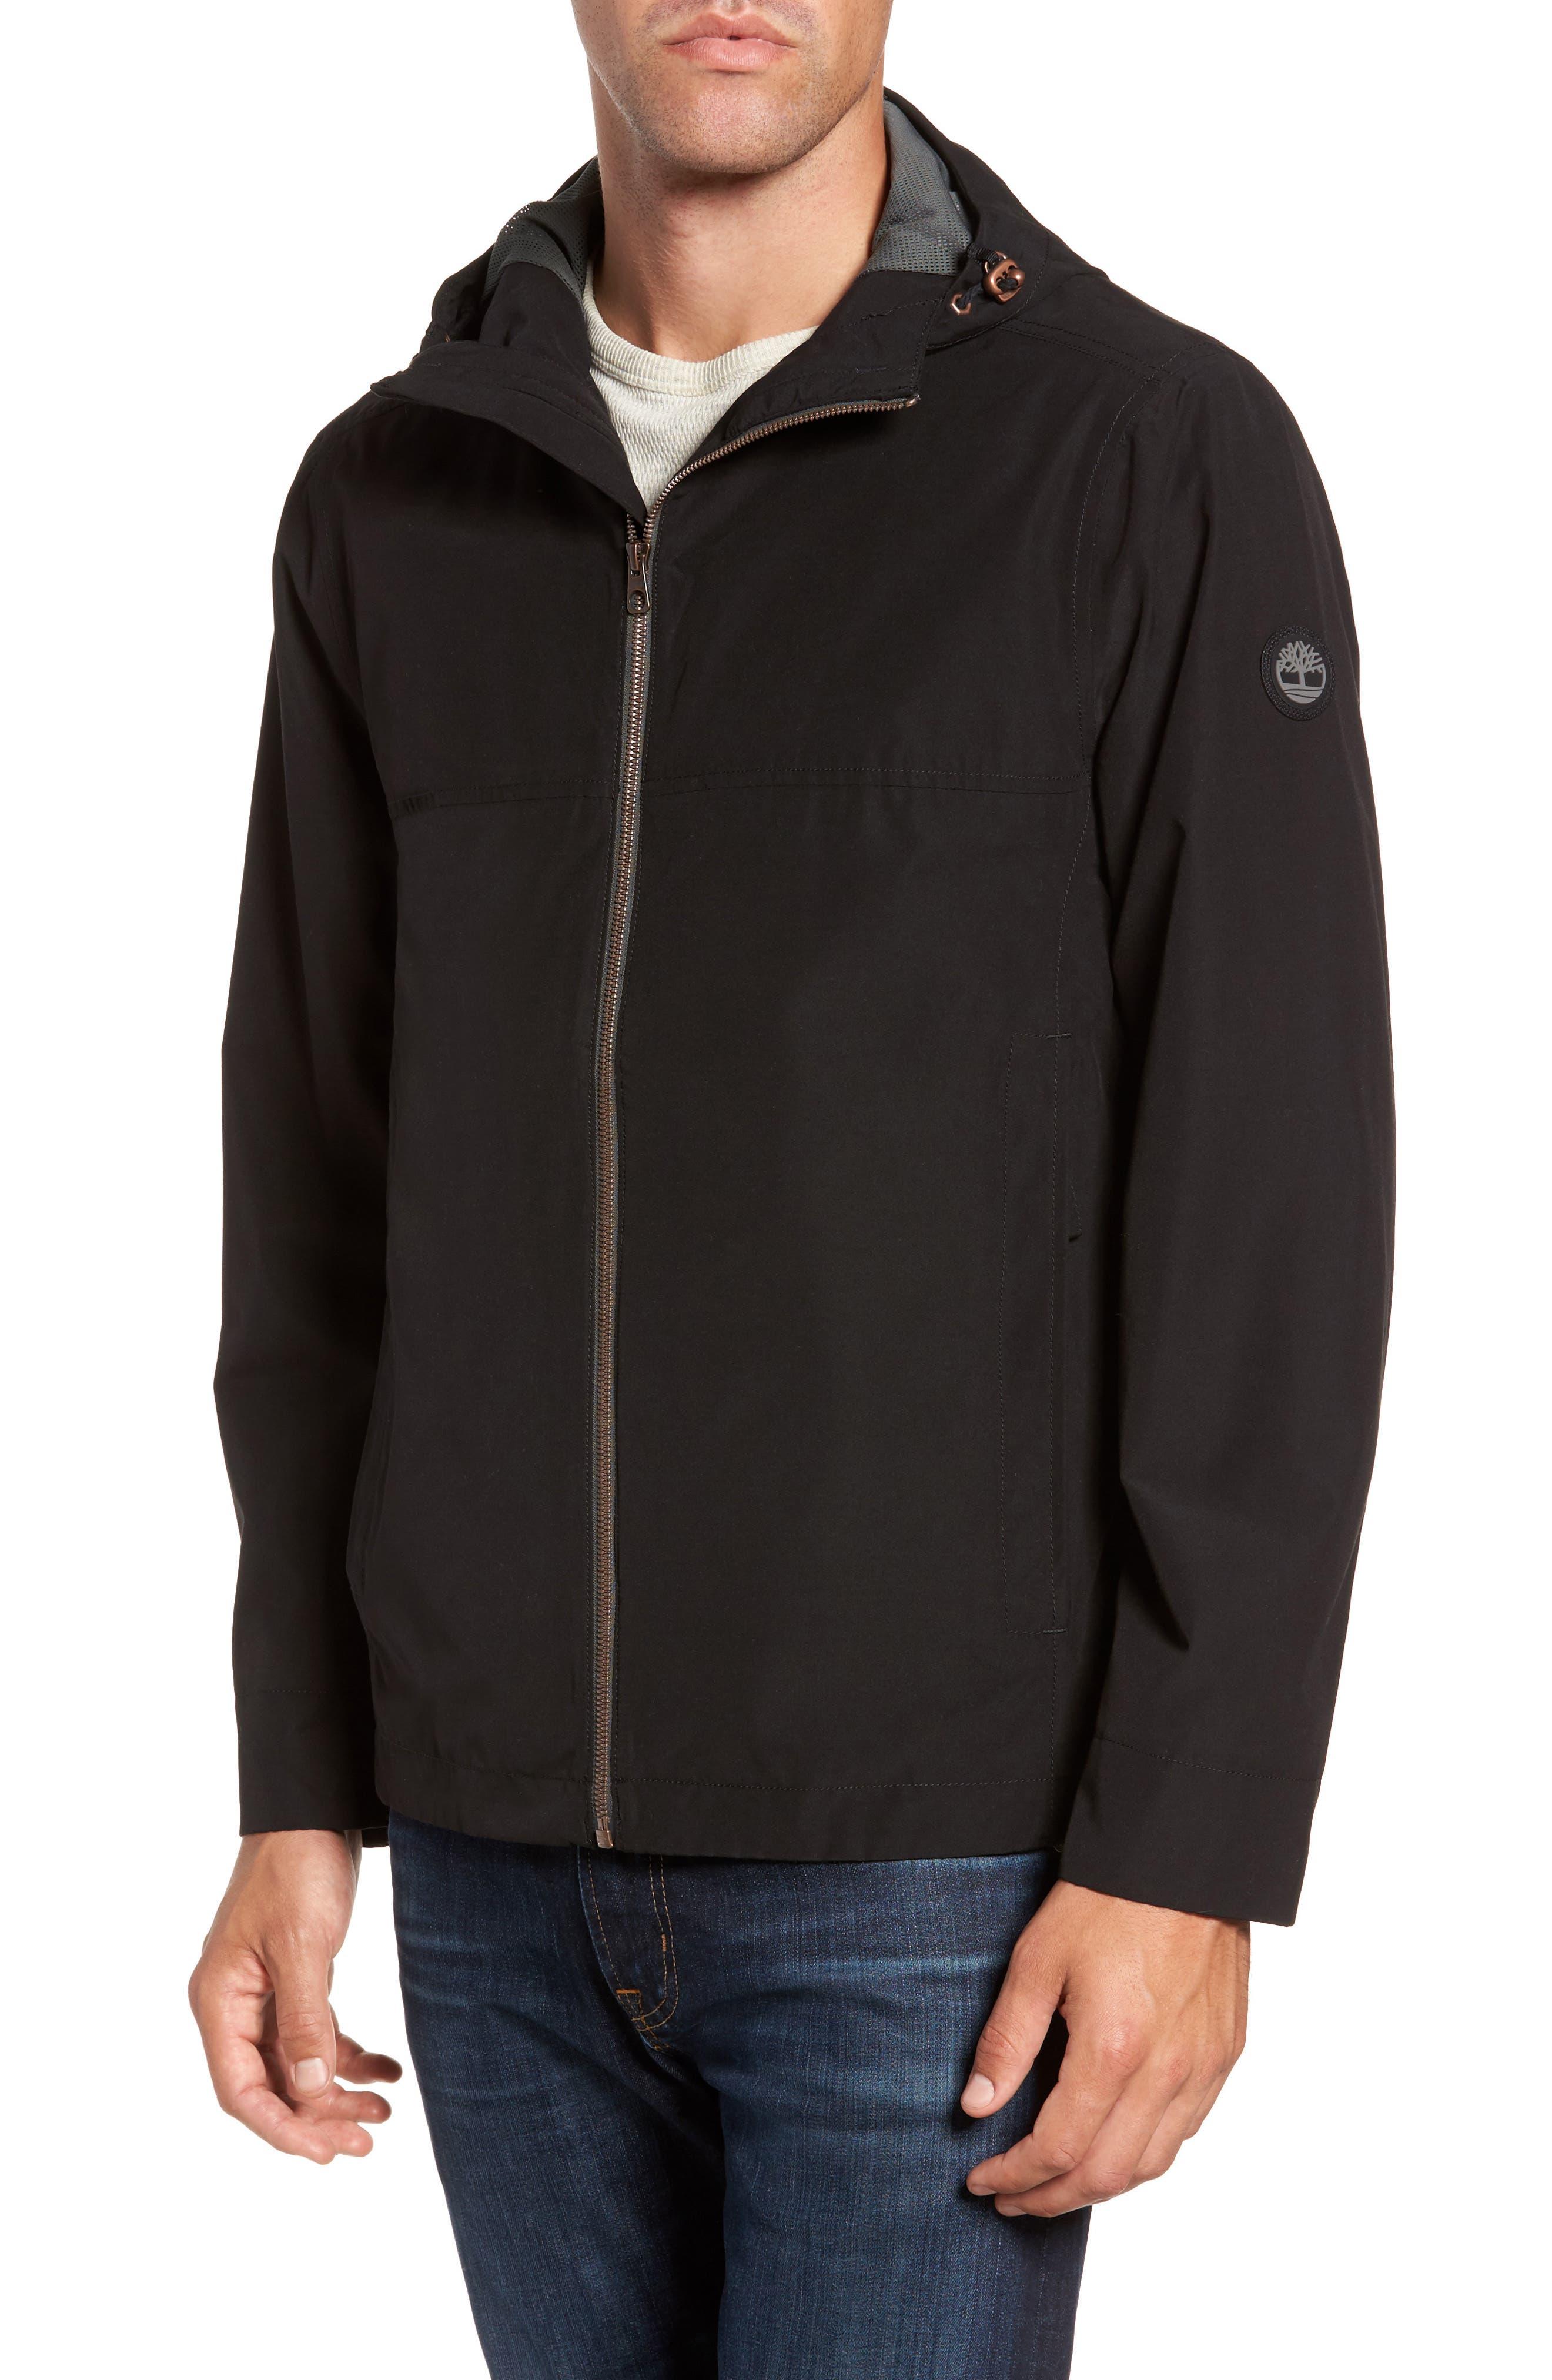 Ragged Mountain Packable Waterproof Jacket,                         Main,                         color, Black